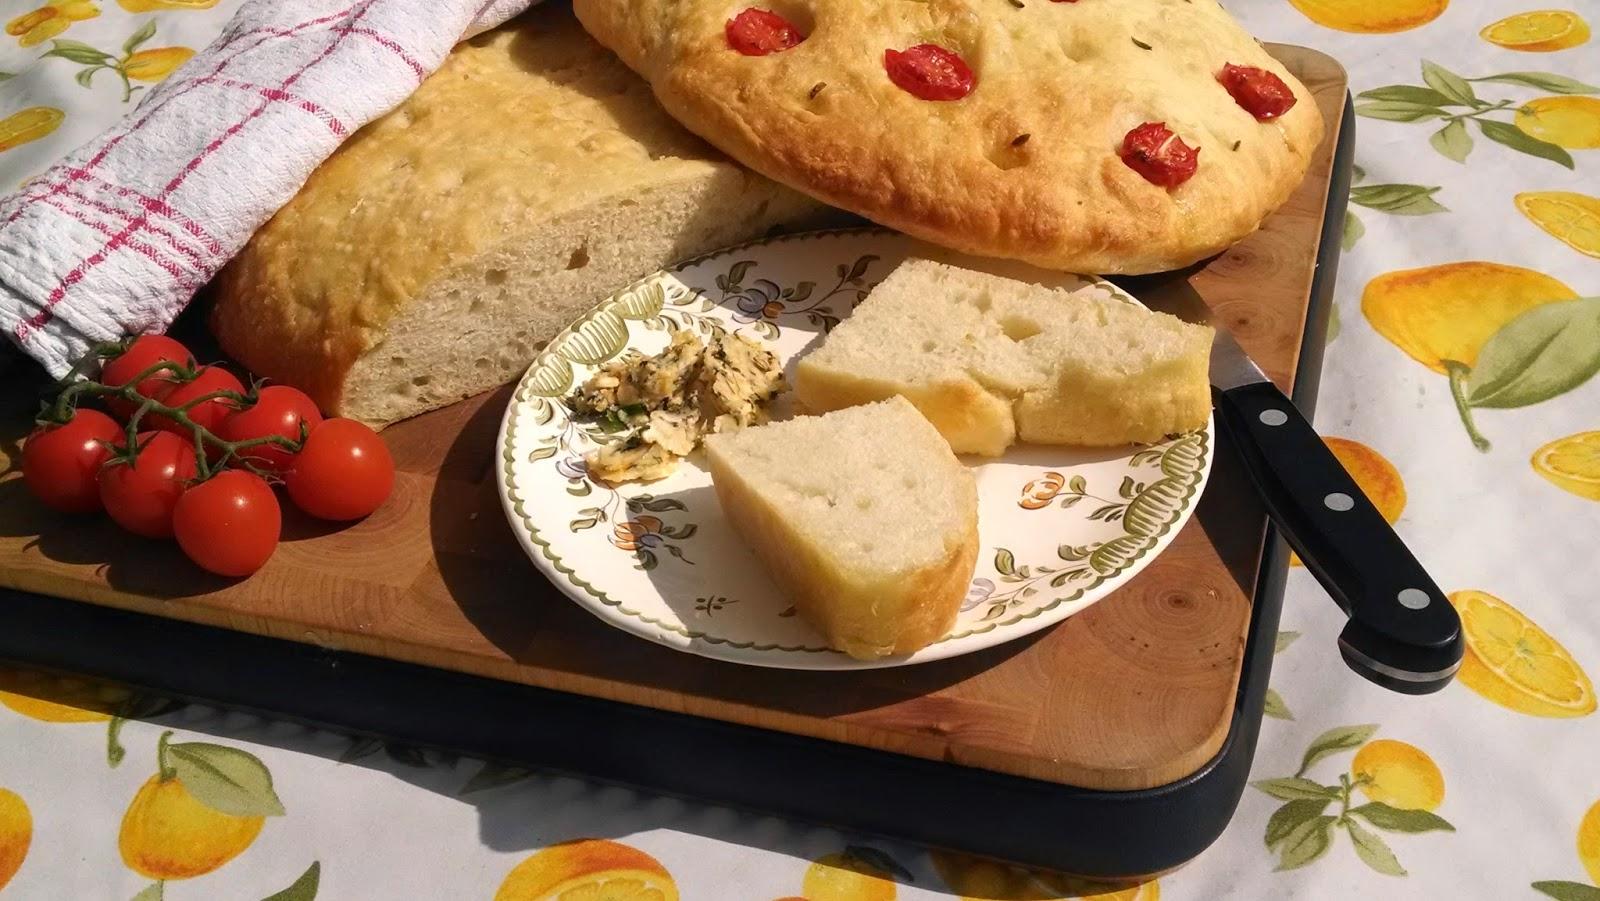 eatdrinksewthink backen mit hefe baking with yeast. Black Bedroom Furniture Sets. Home Design Ideas